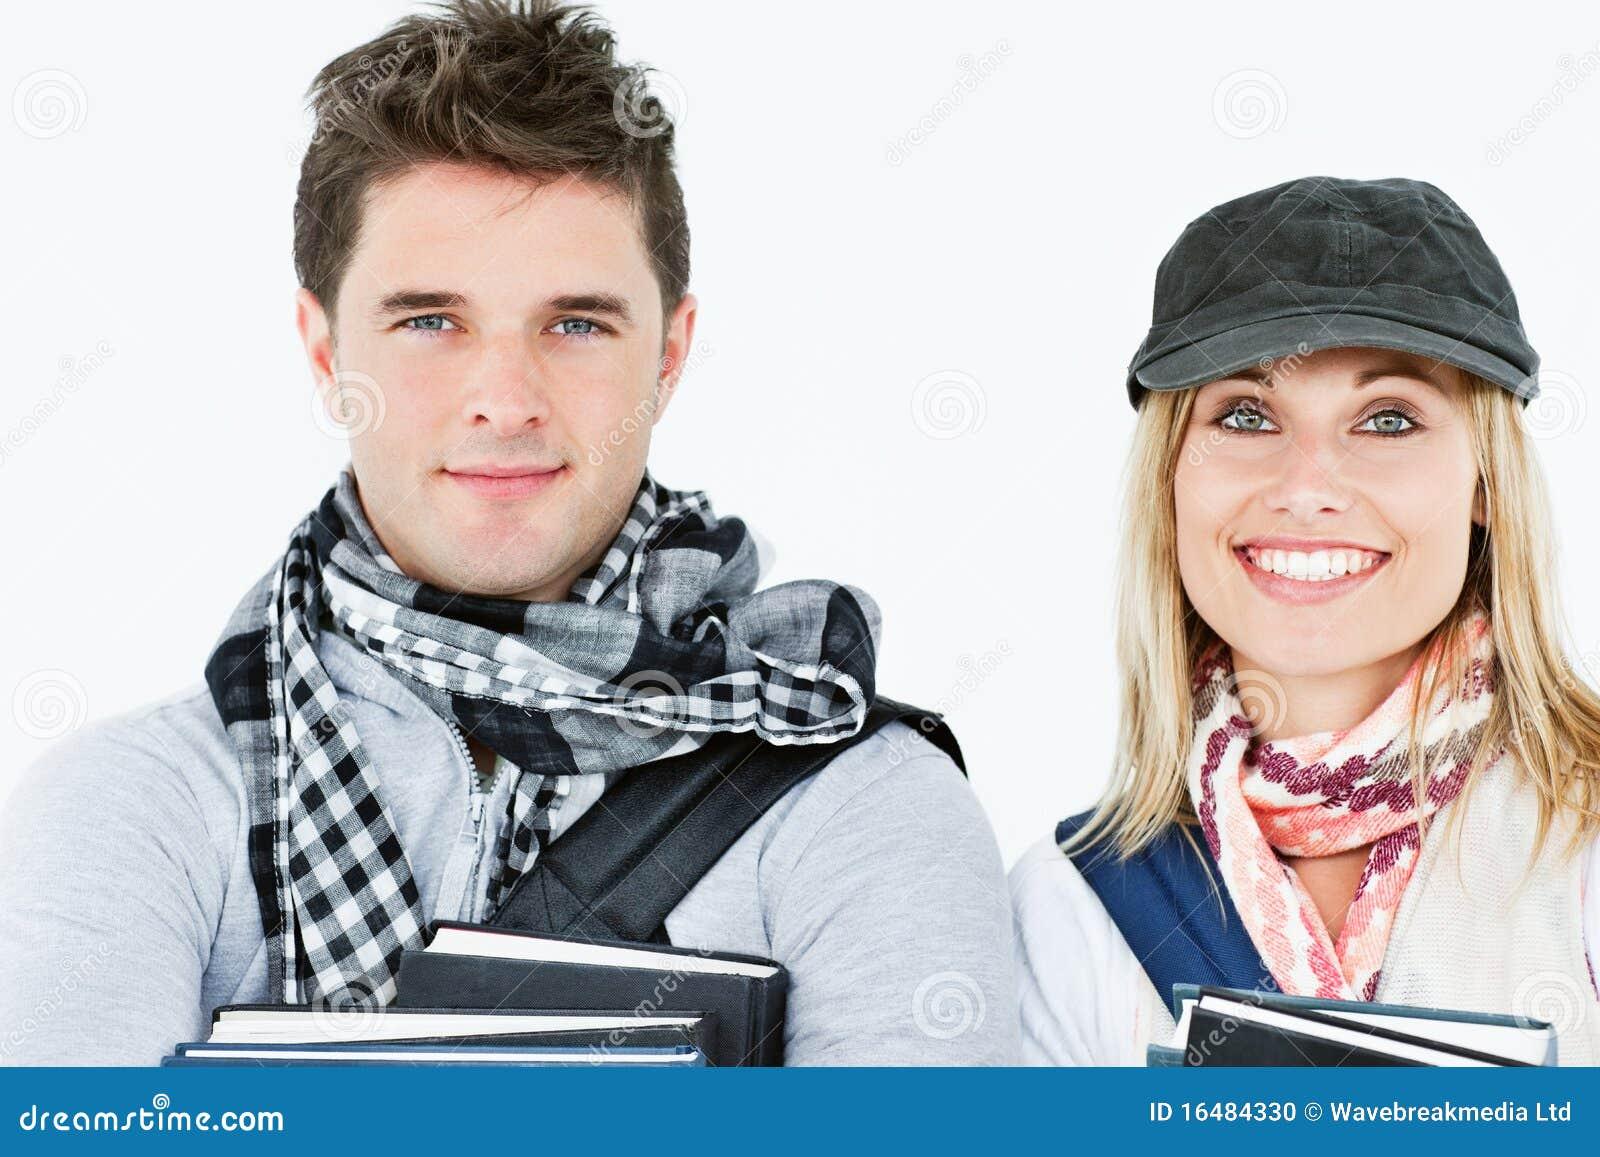 Portretten van twee glimlachende studenten die boeken houden